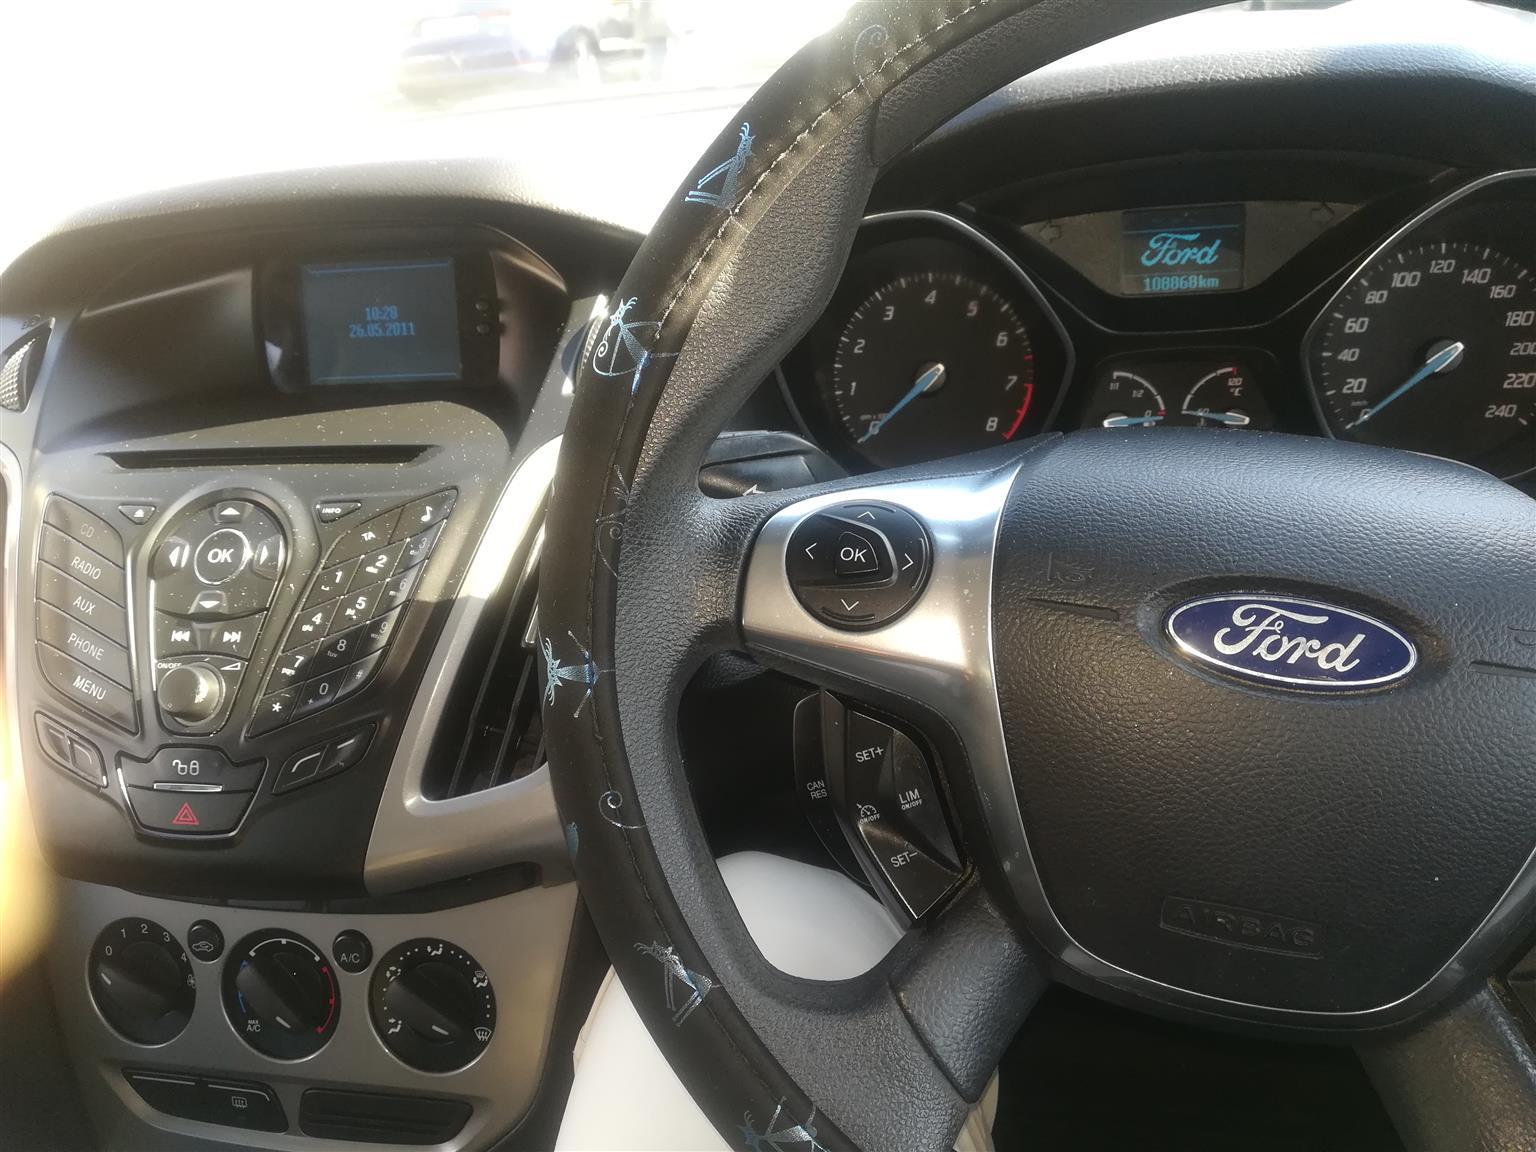 2011 Ford Focus 1.6 5 door Ambiente